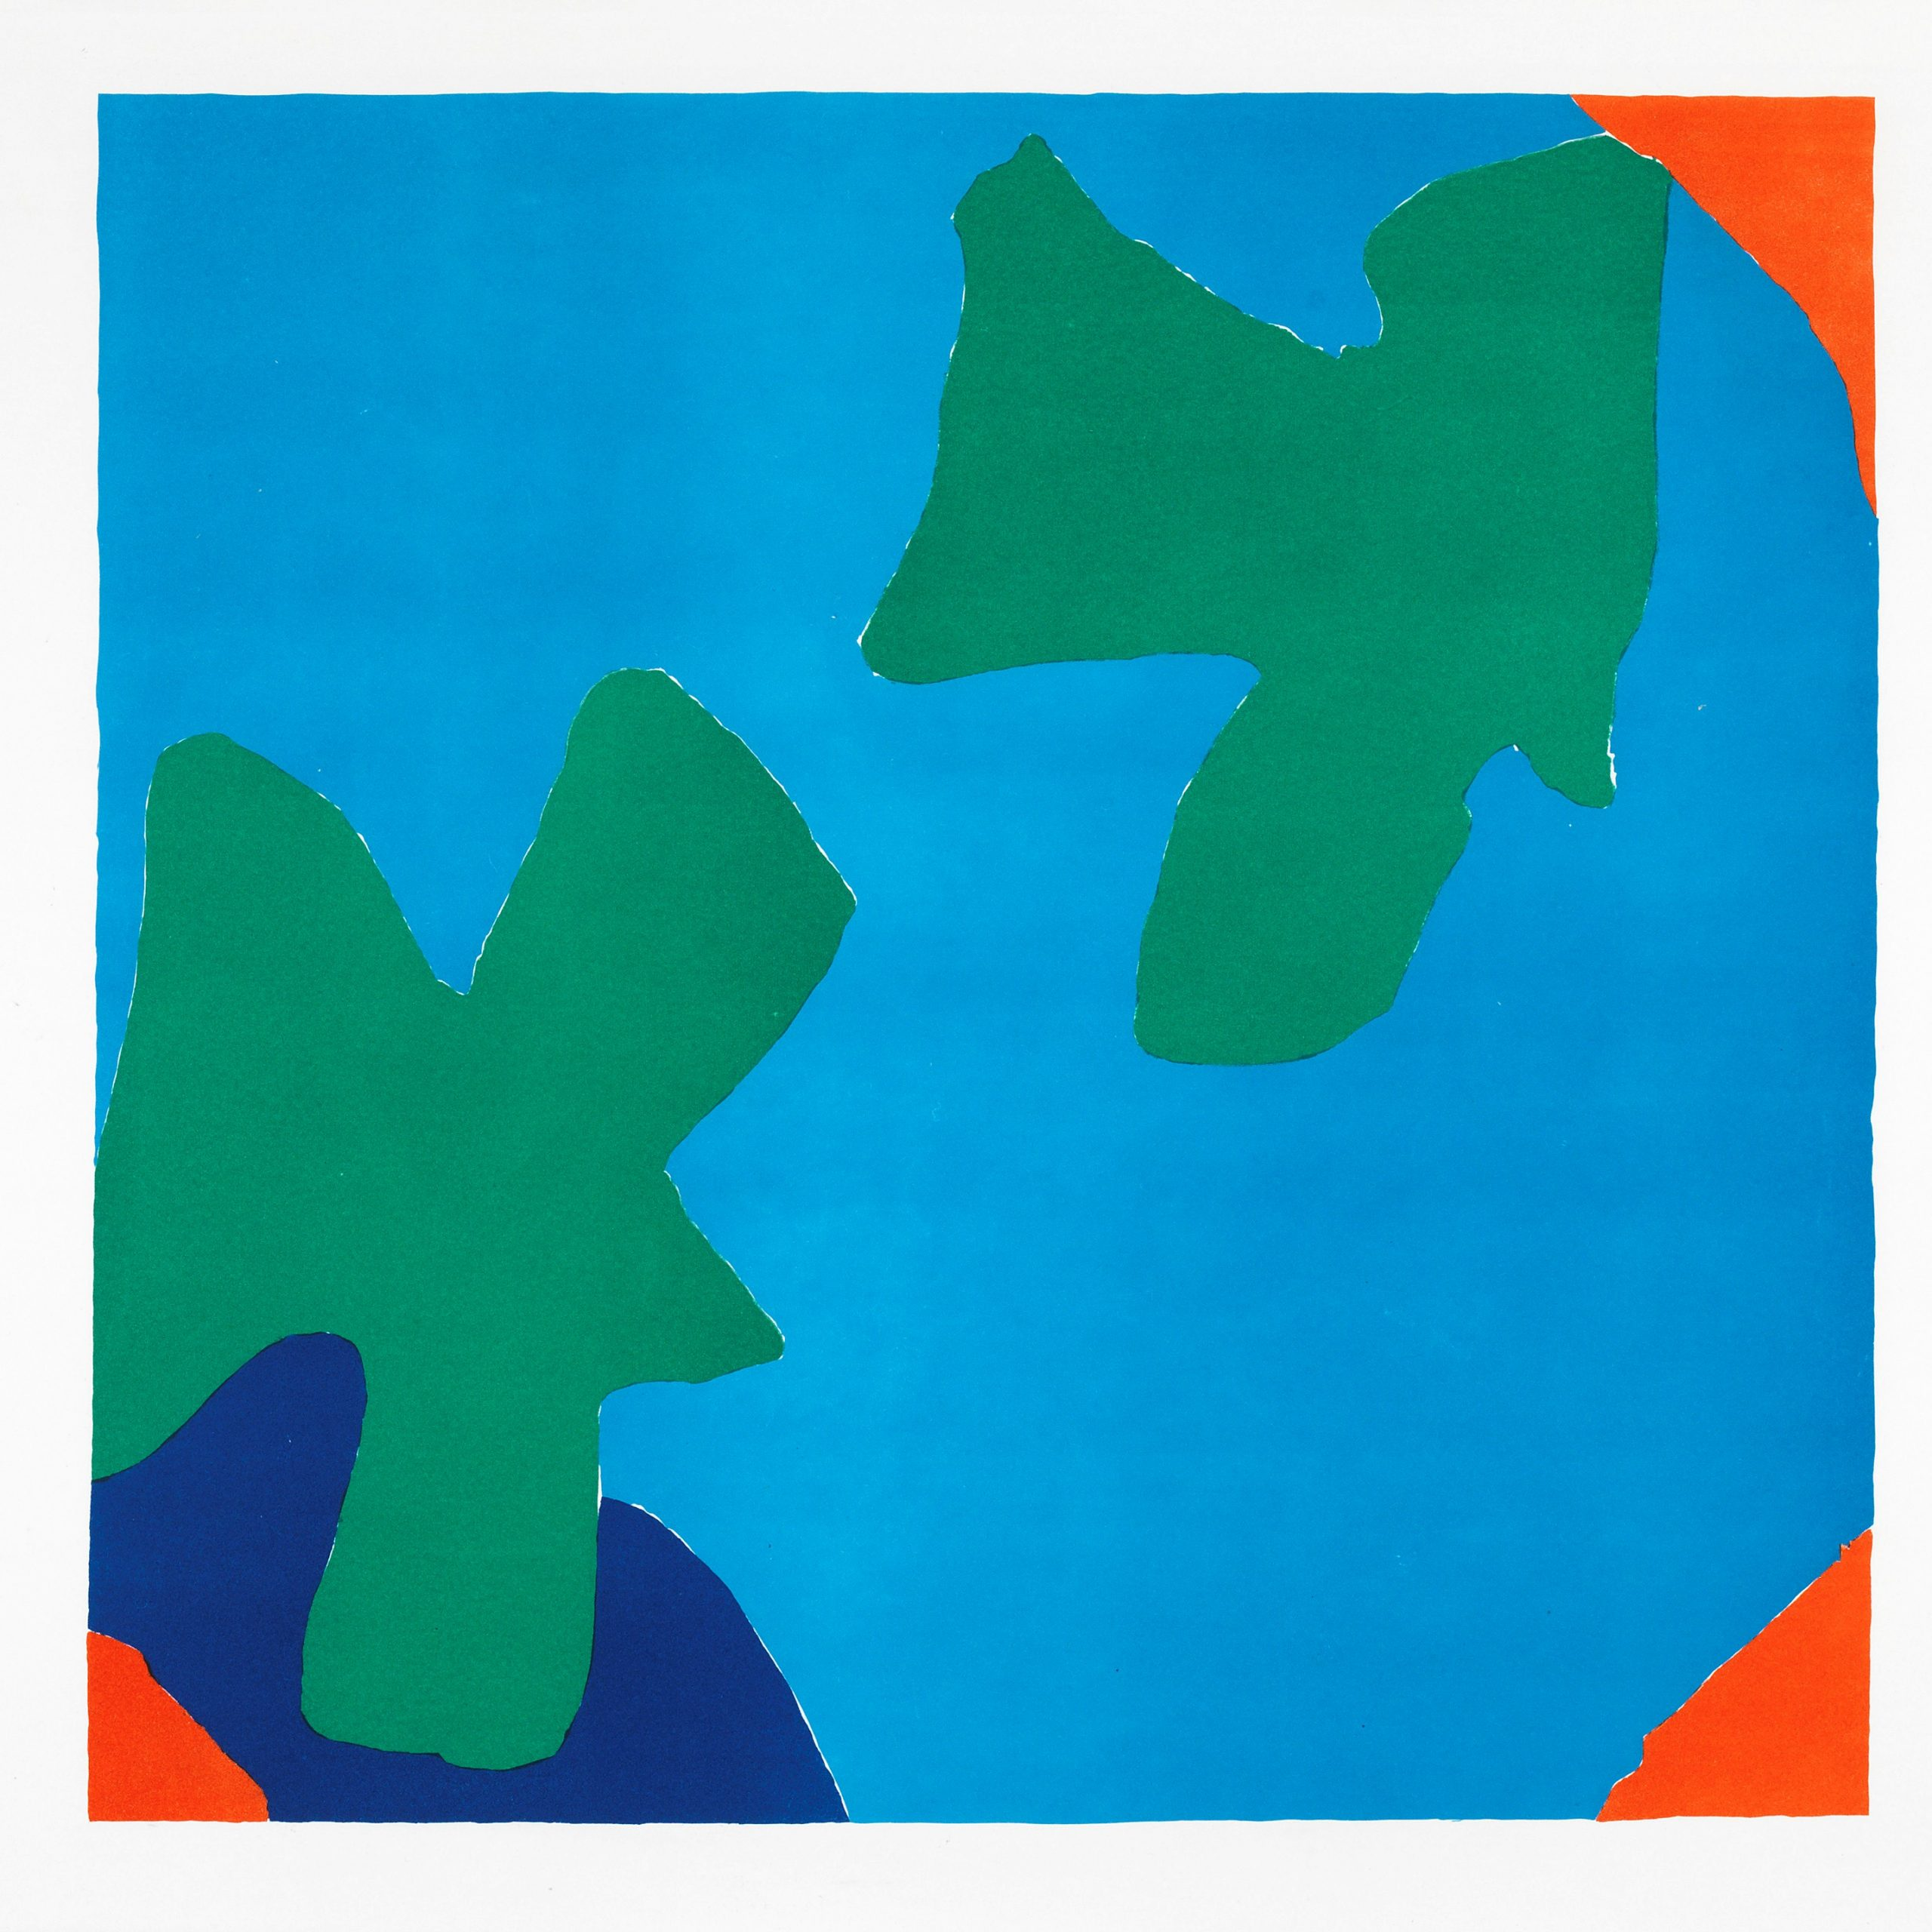 Phillip Sutton, San Francisco, 1966, Courtesy of Jenna Burlingham Fine Art